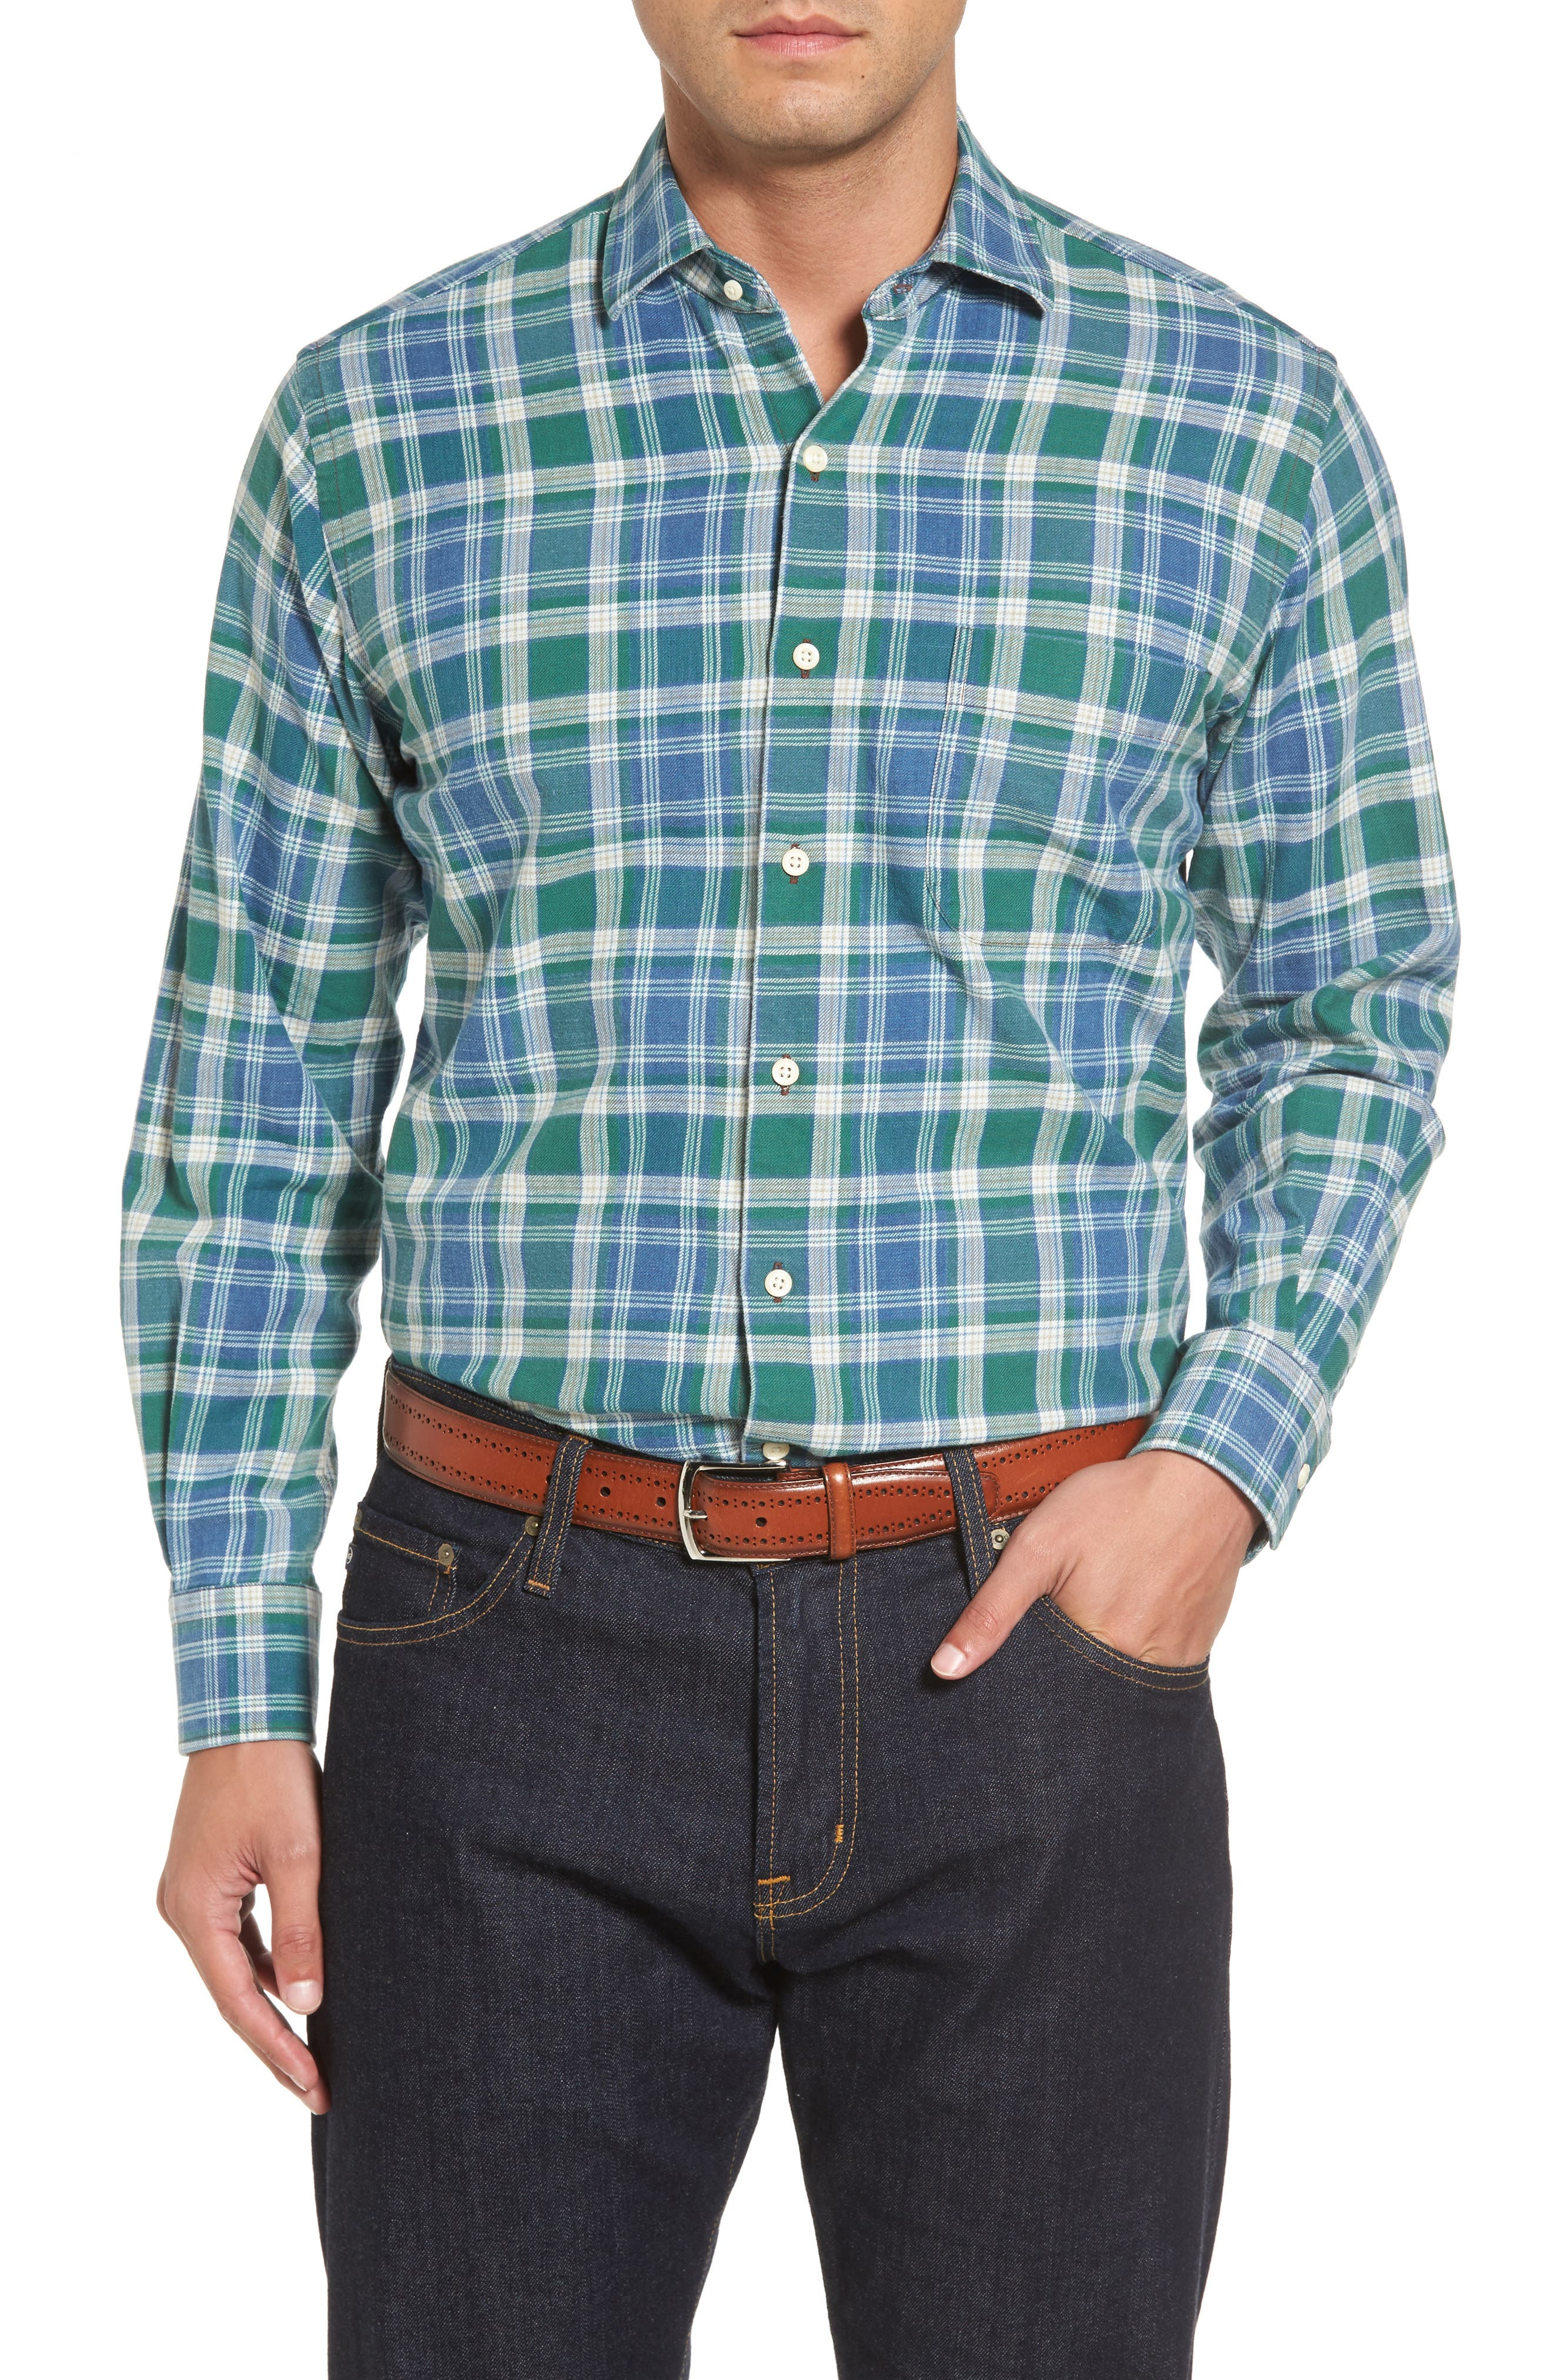 Alternate Image 1 Selected - Peter Millar Rocky Regular Fit Plaid Sport Shirt